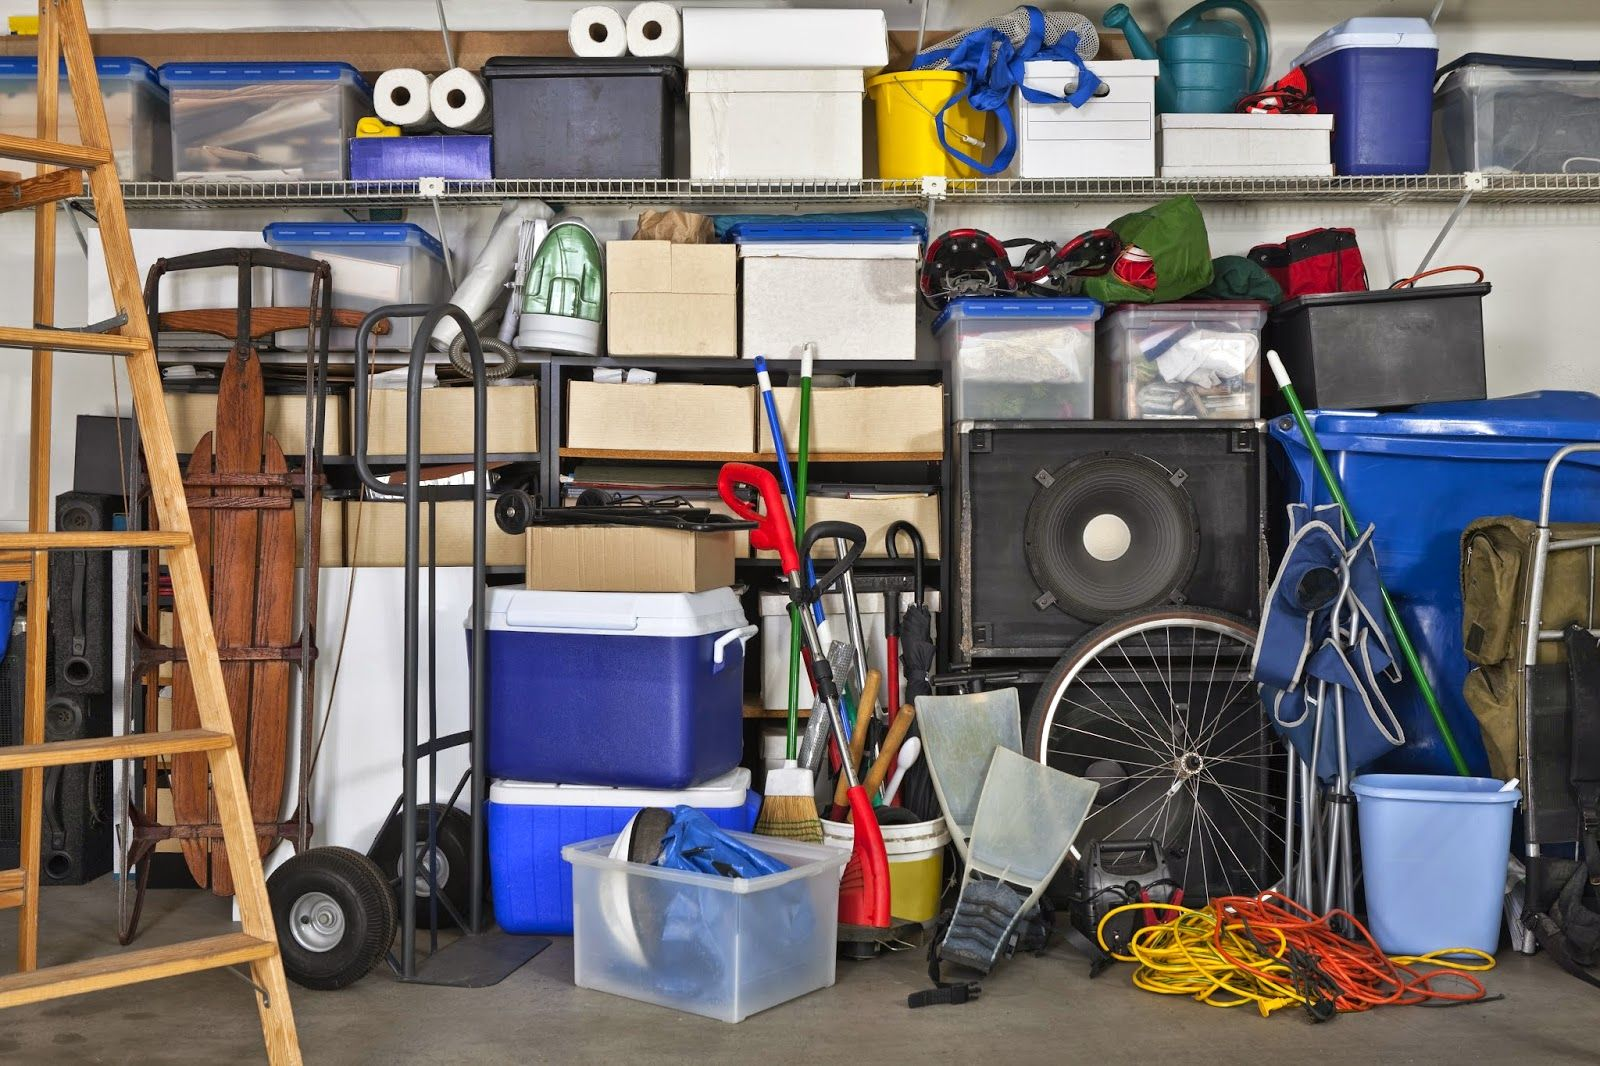 Agréable Ranger Son Garage #9: Location-garde-meuble-self-stockage: Comment Bien Ranger Son Garage ?